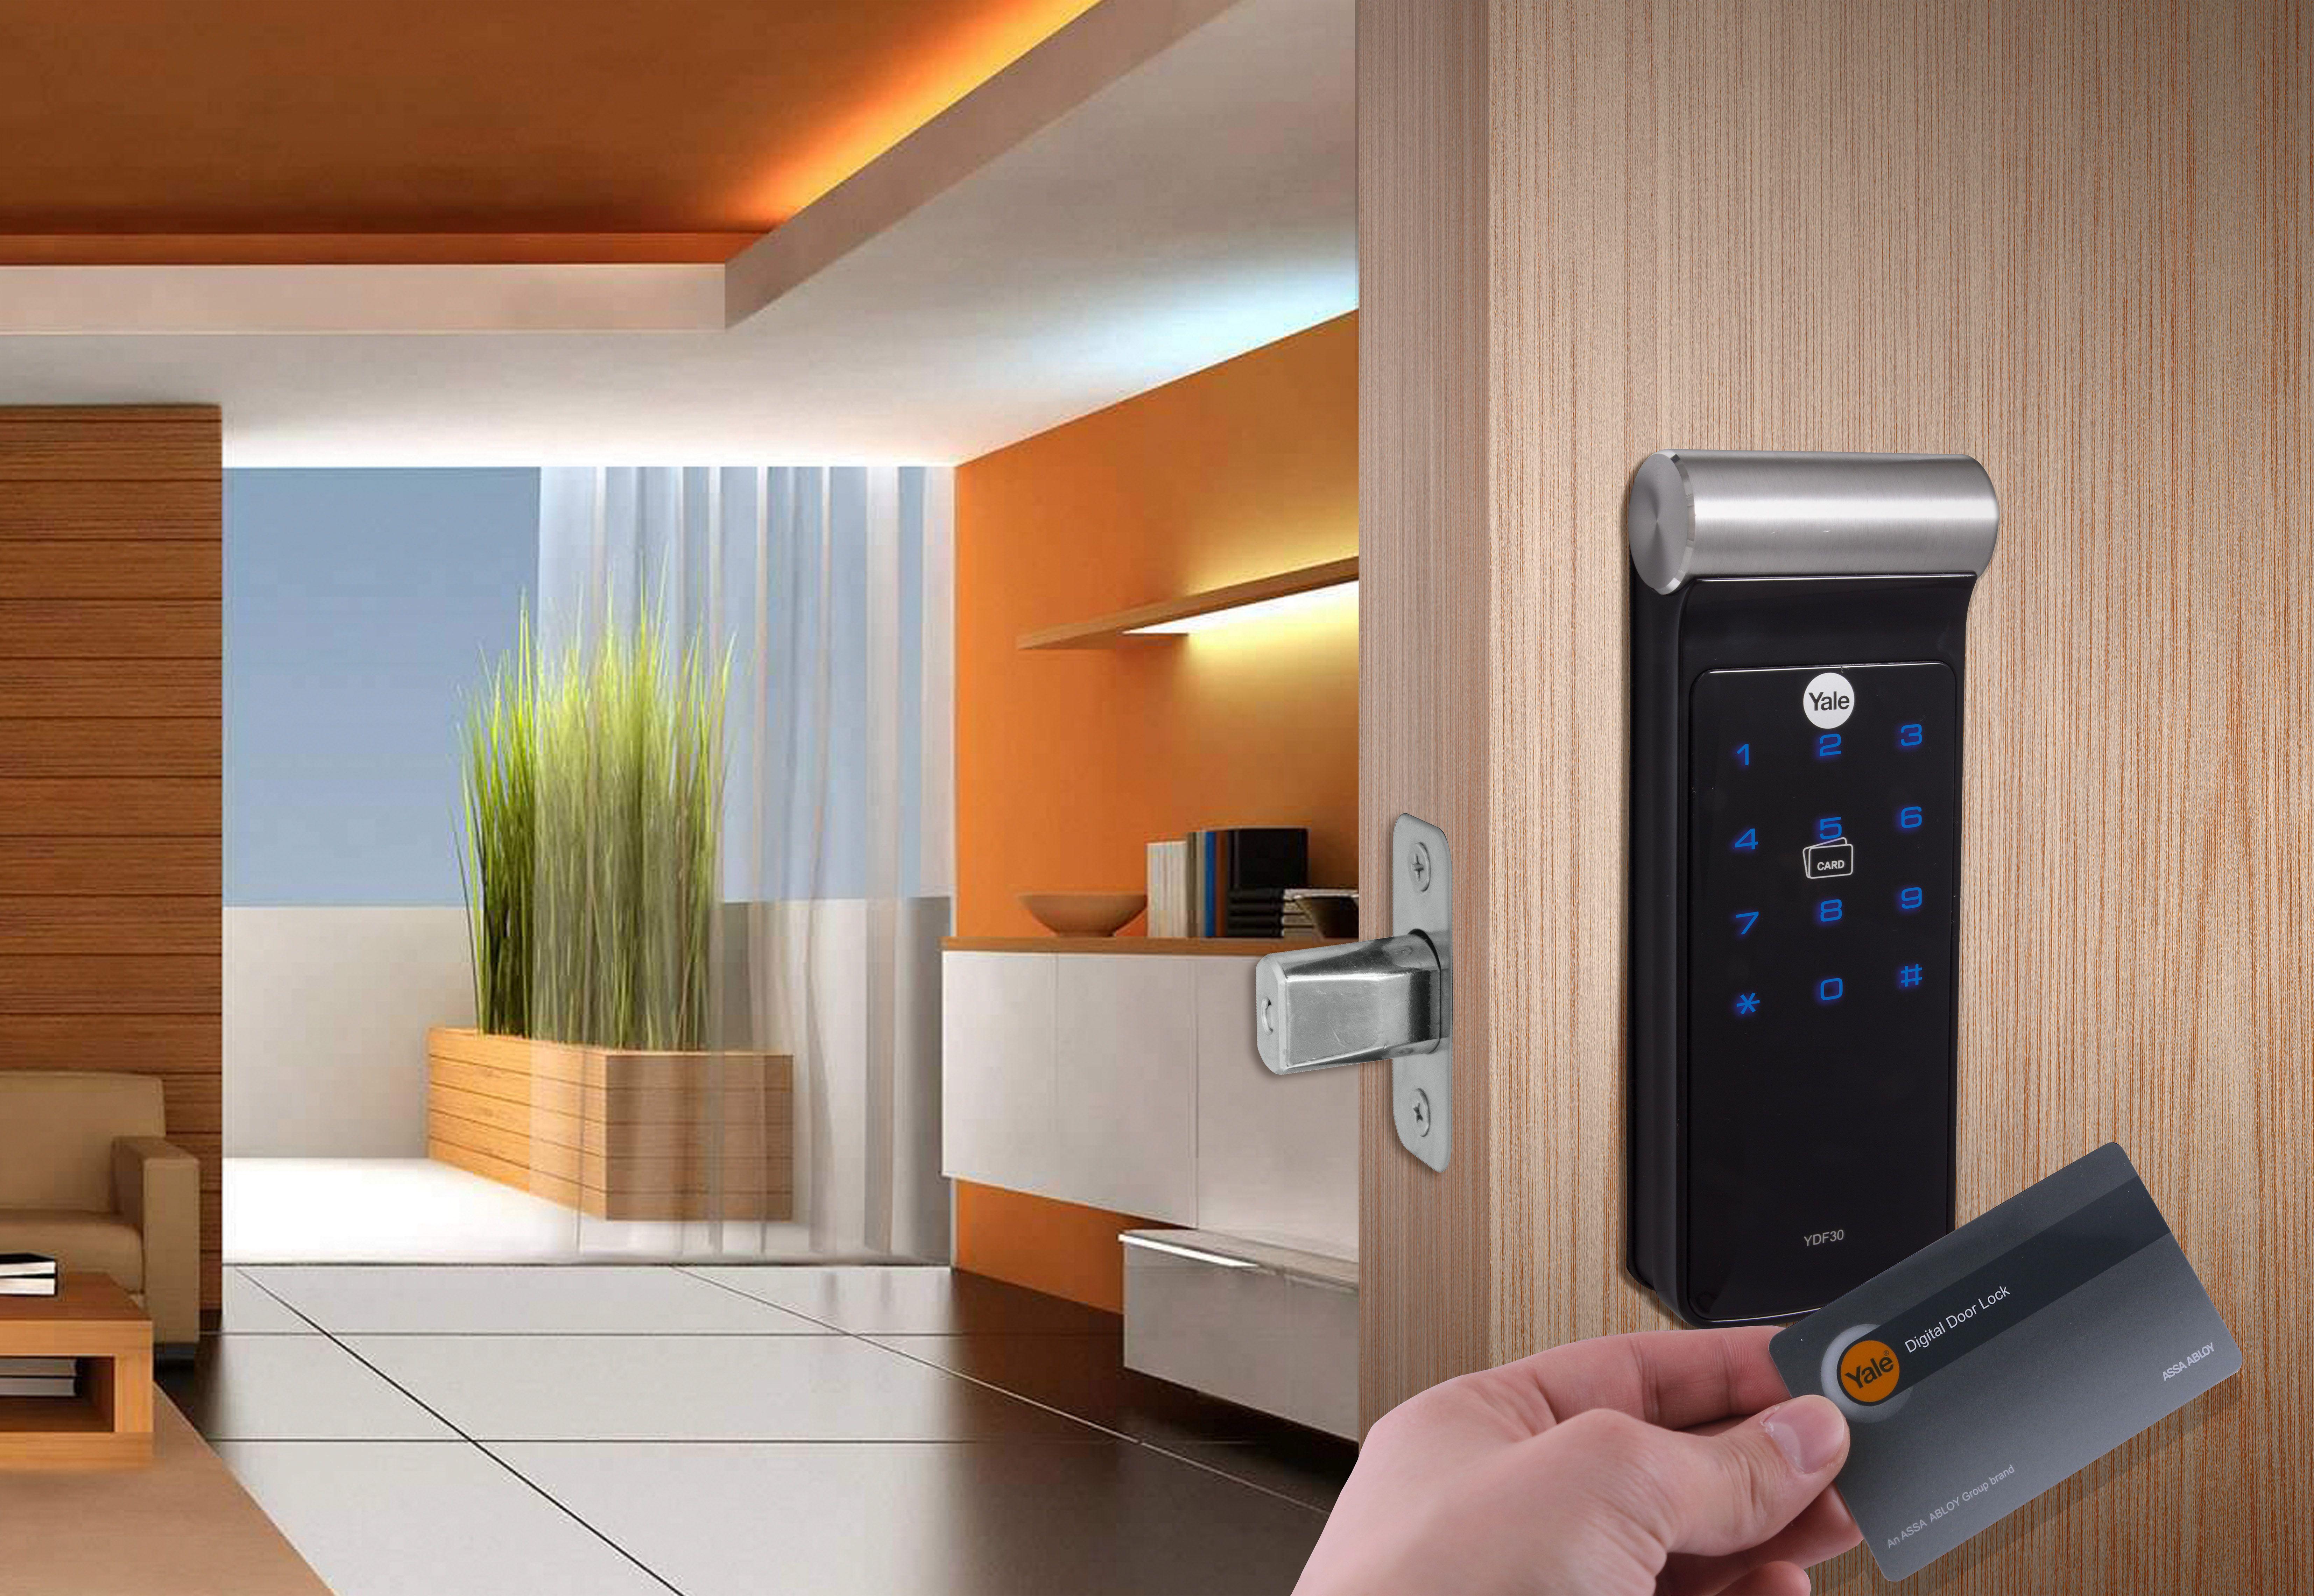 doors gift digital ymf pad st door fingerprint productdetail safety lock guchi yale box